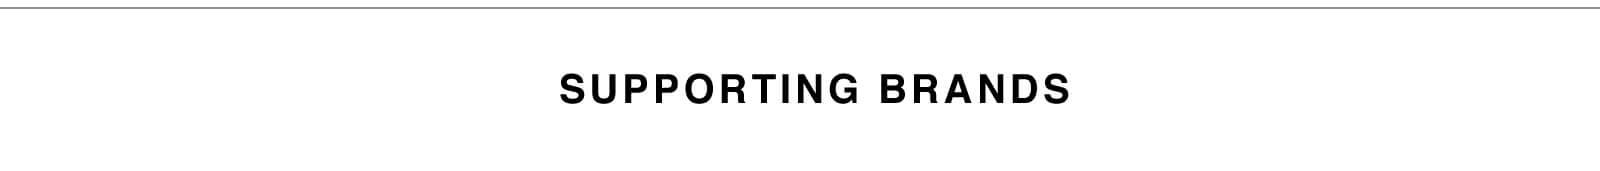 Hermazing bag sponsors launch